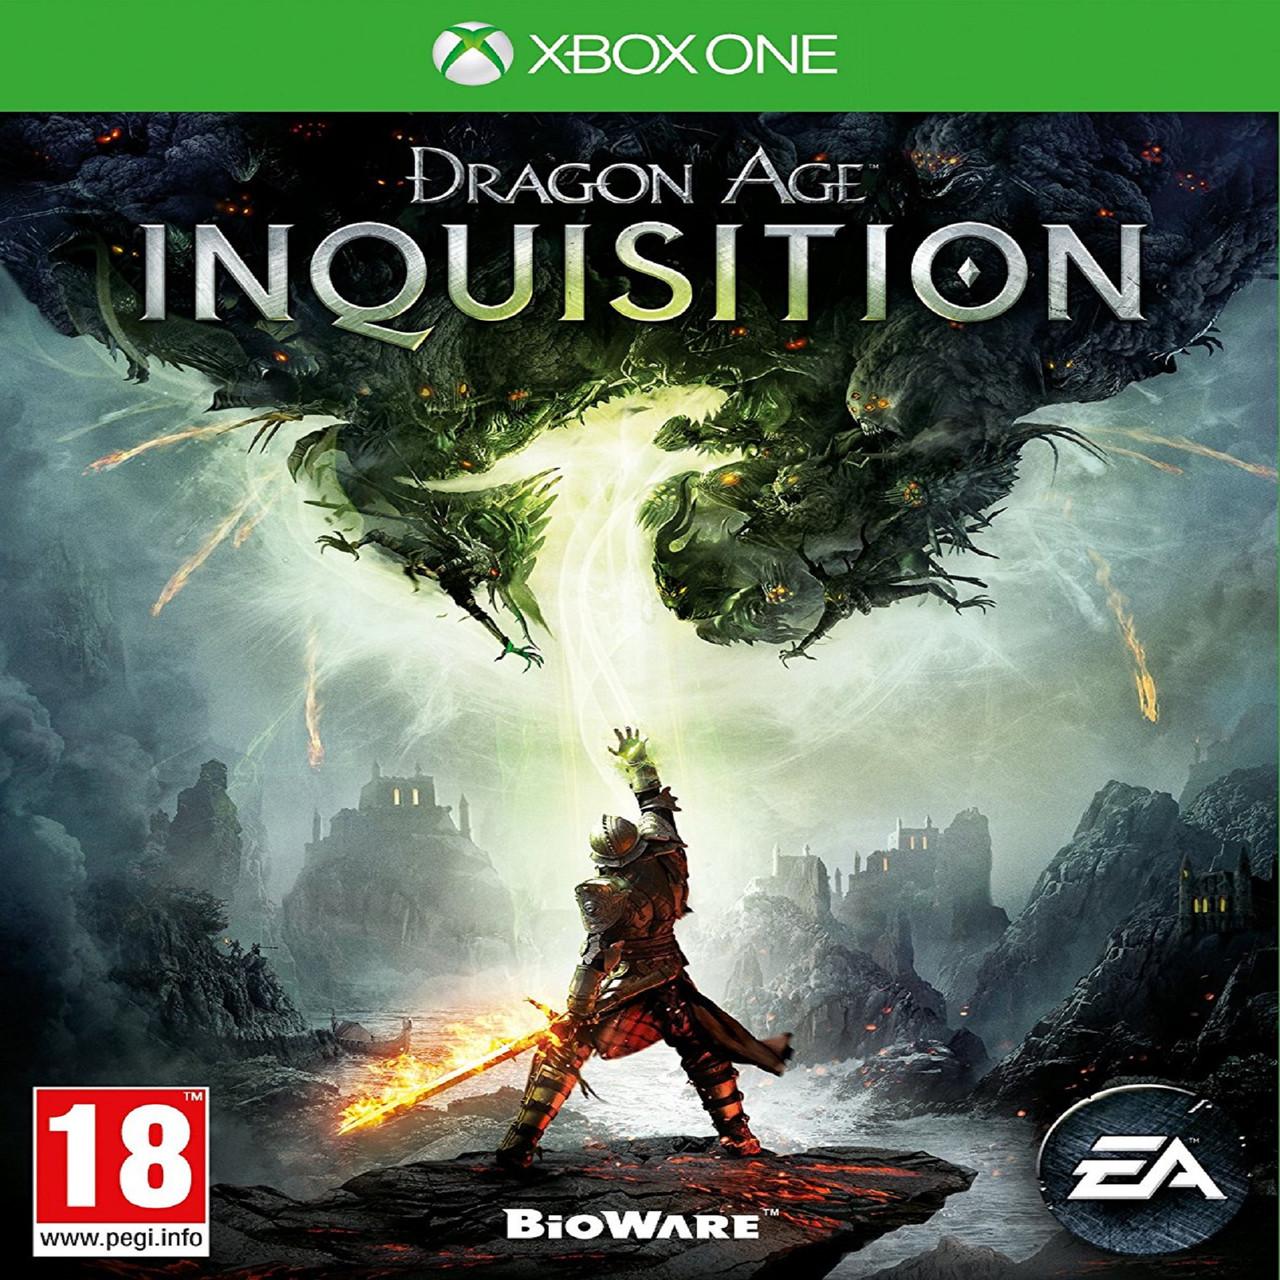 Dragon Age: Inquisition RUS XBOX ONE (Б/В)